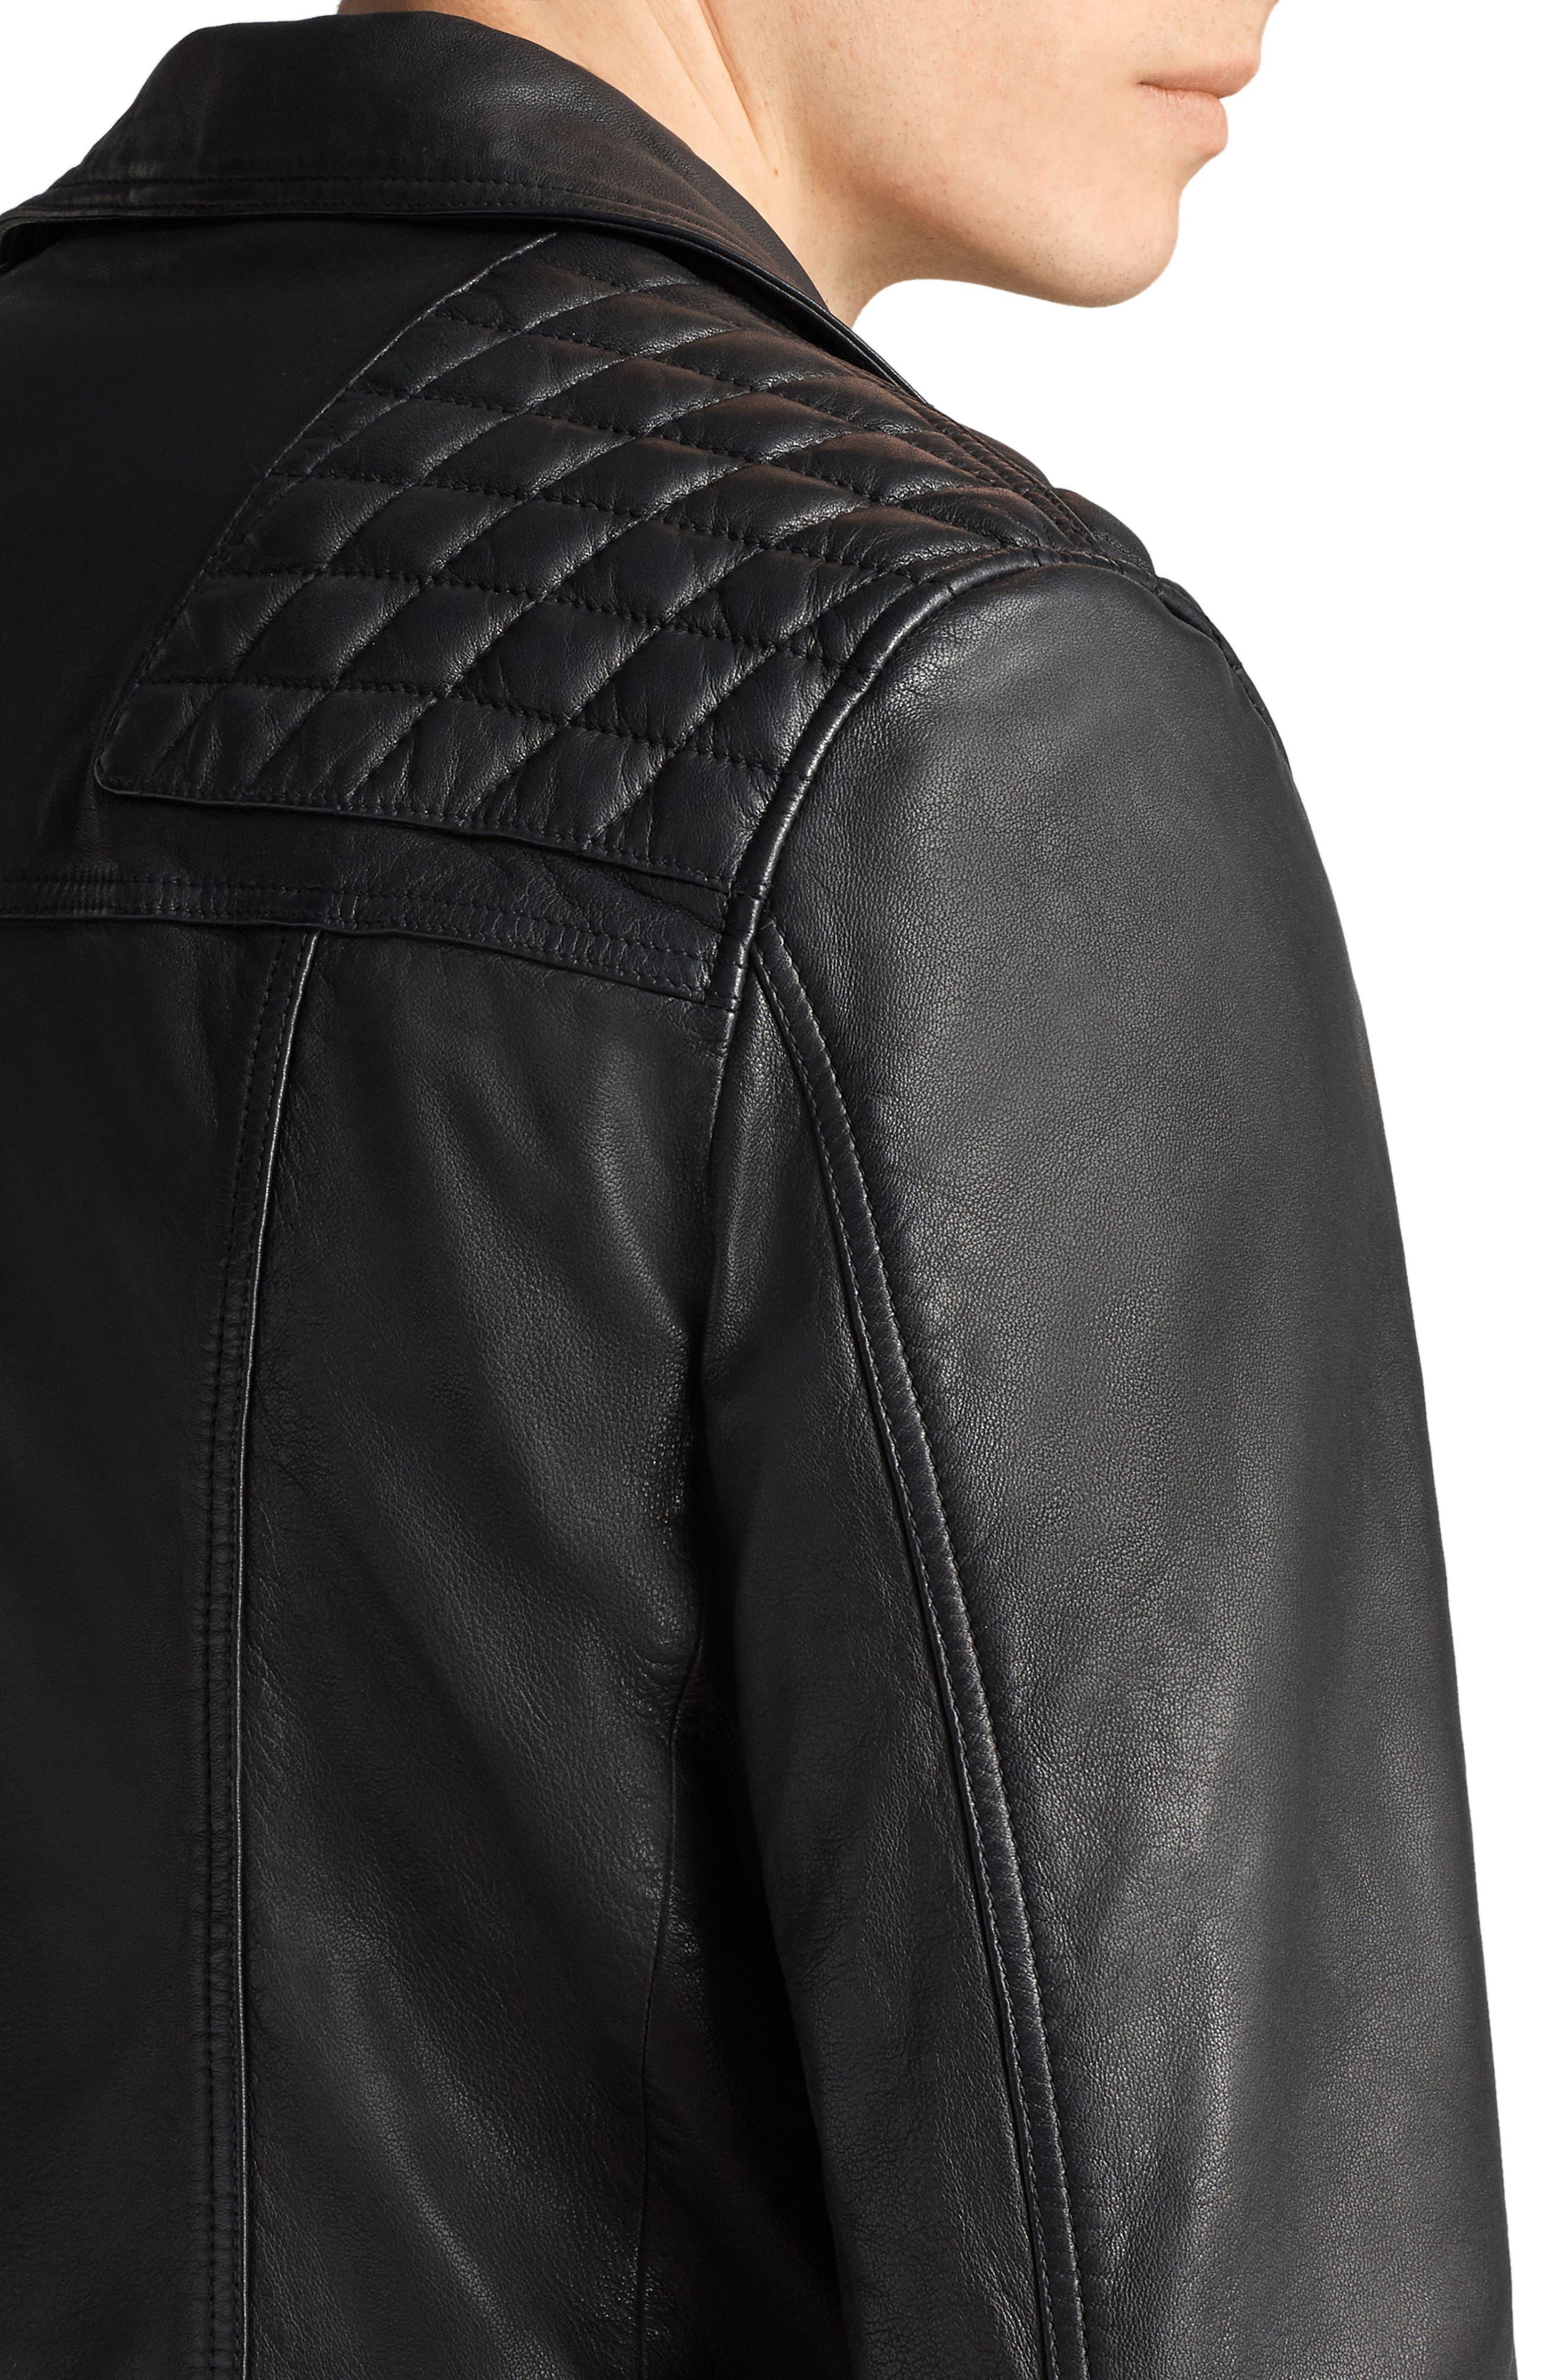 Taro Slim Fit Leather Biker Jacket,                             Alternate thumbnail 7, color,                             001